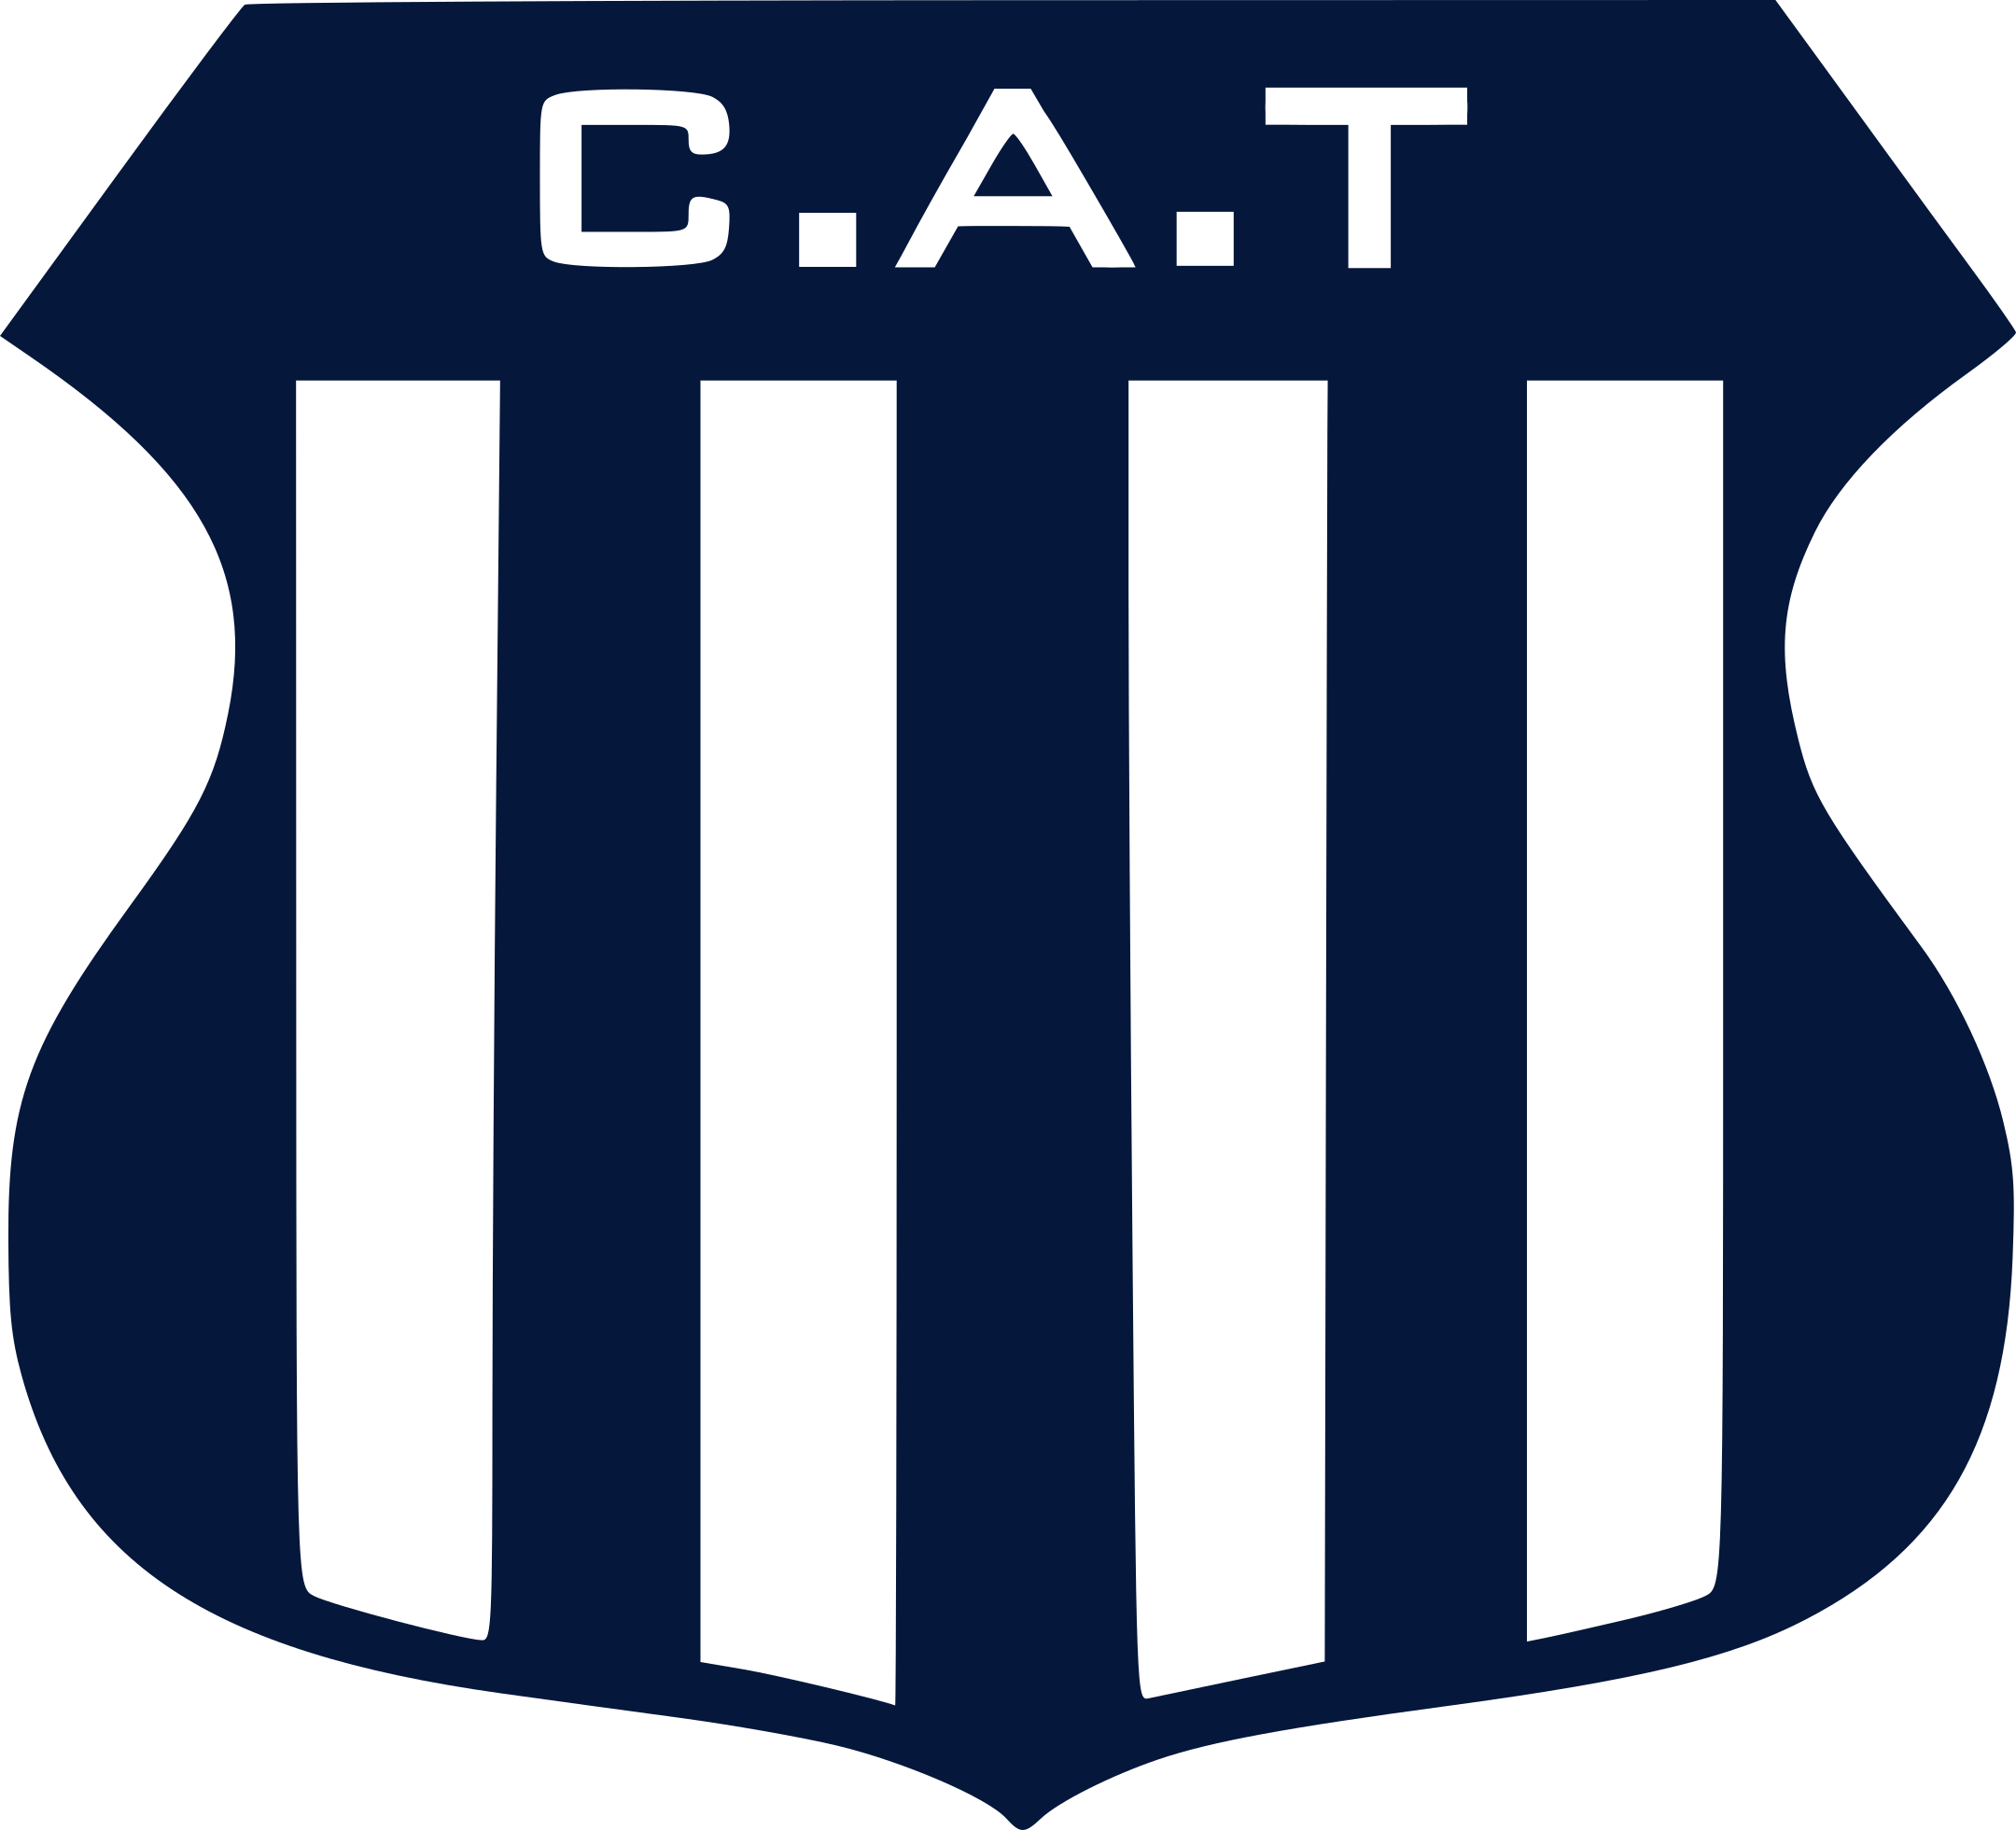 club talleres logo 1 - Club Atlético Talleres Logo